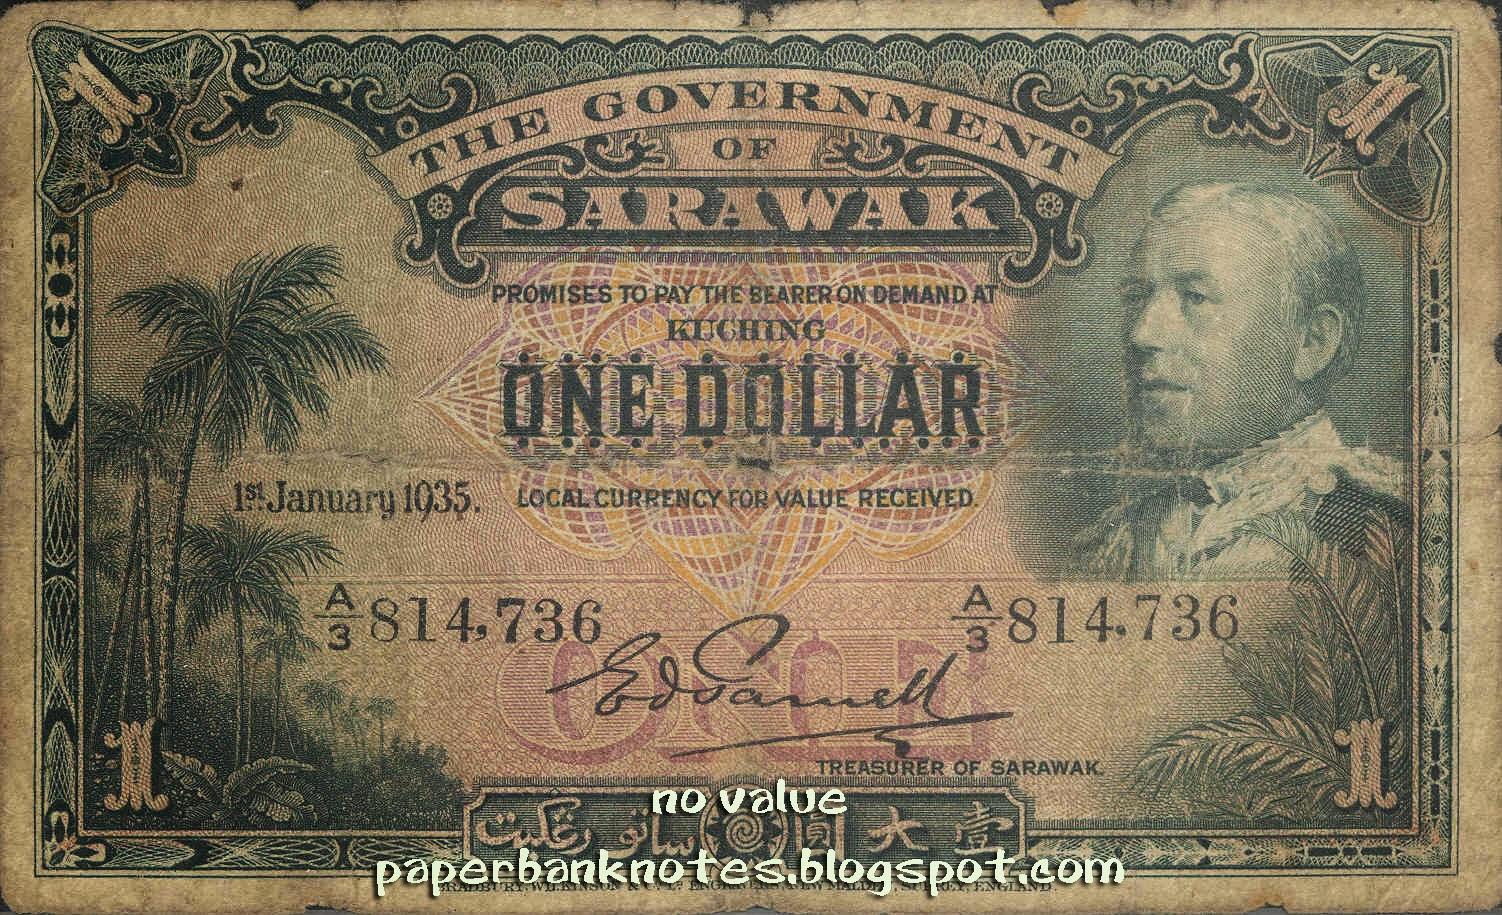 http://seabanknotes.blogspot.com/2014/02/sarawak-1935.html